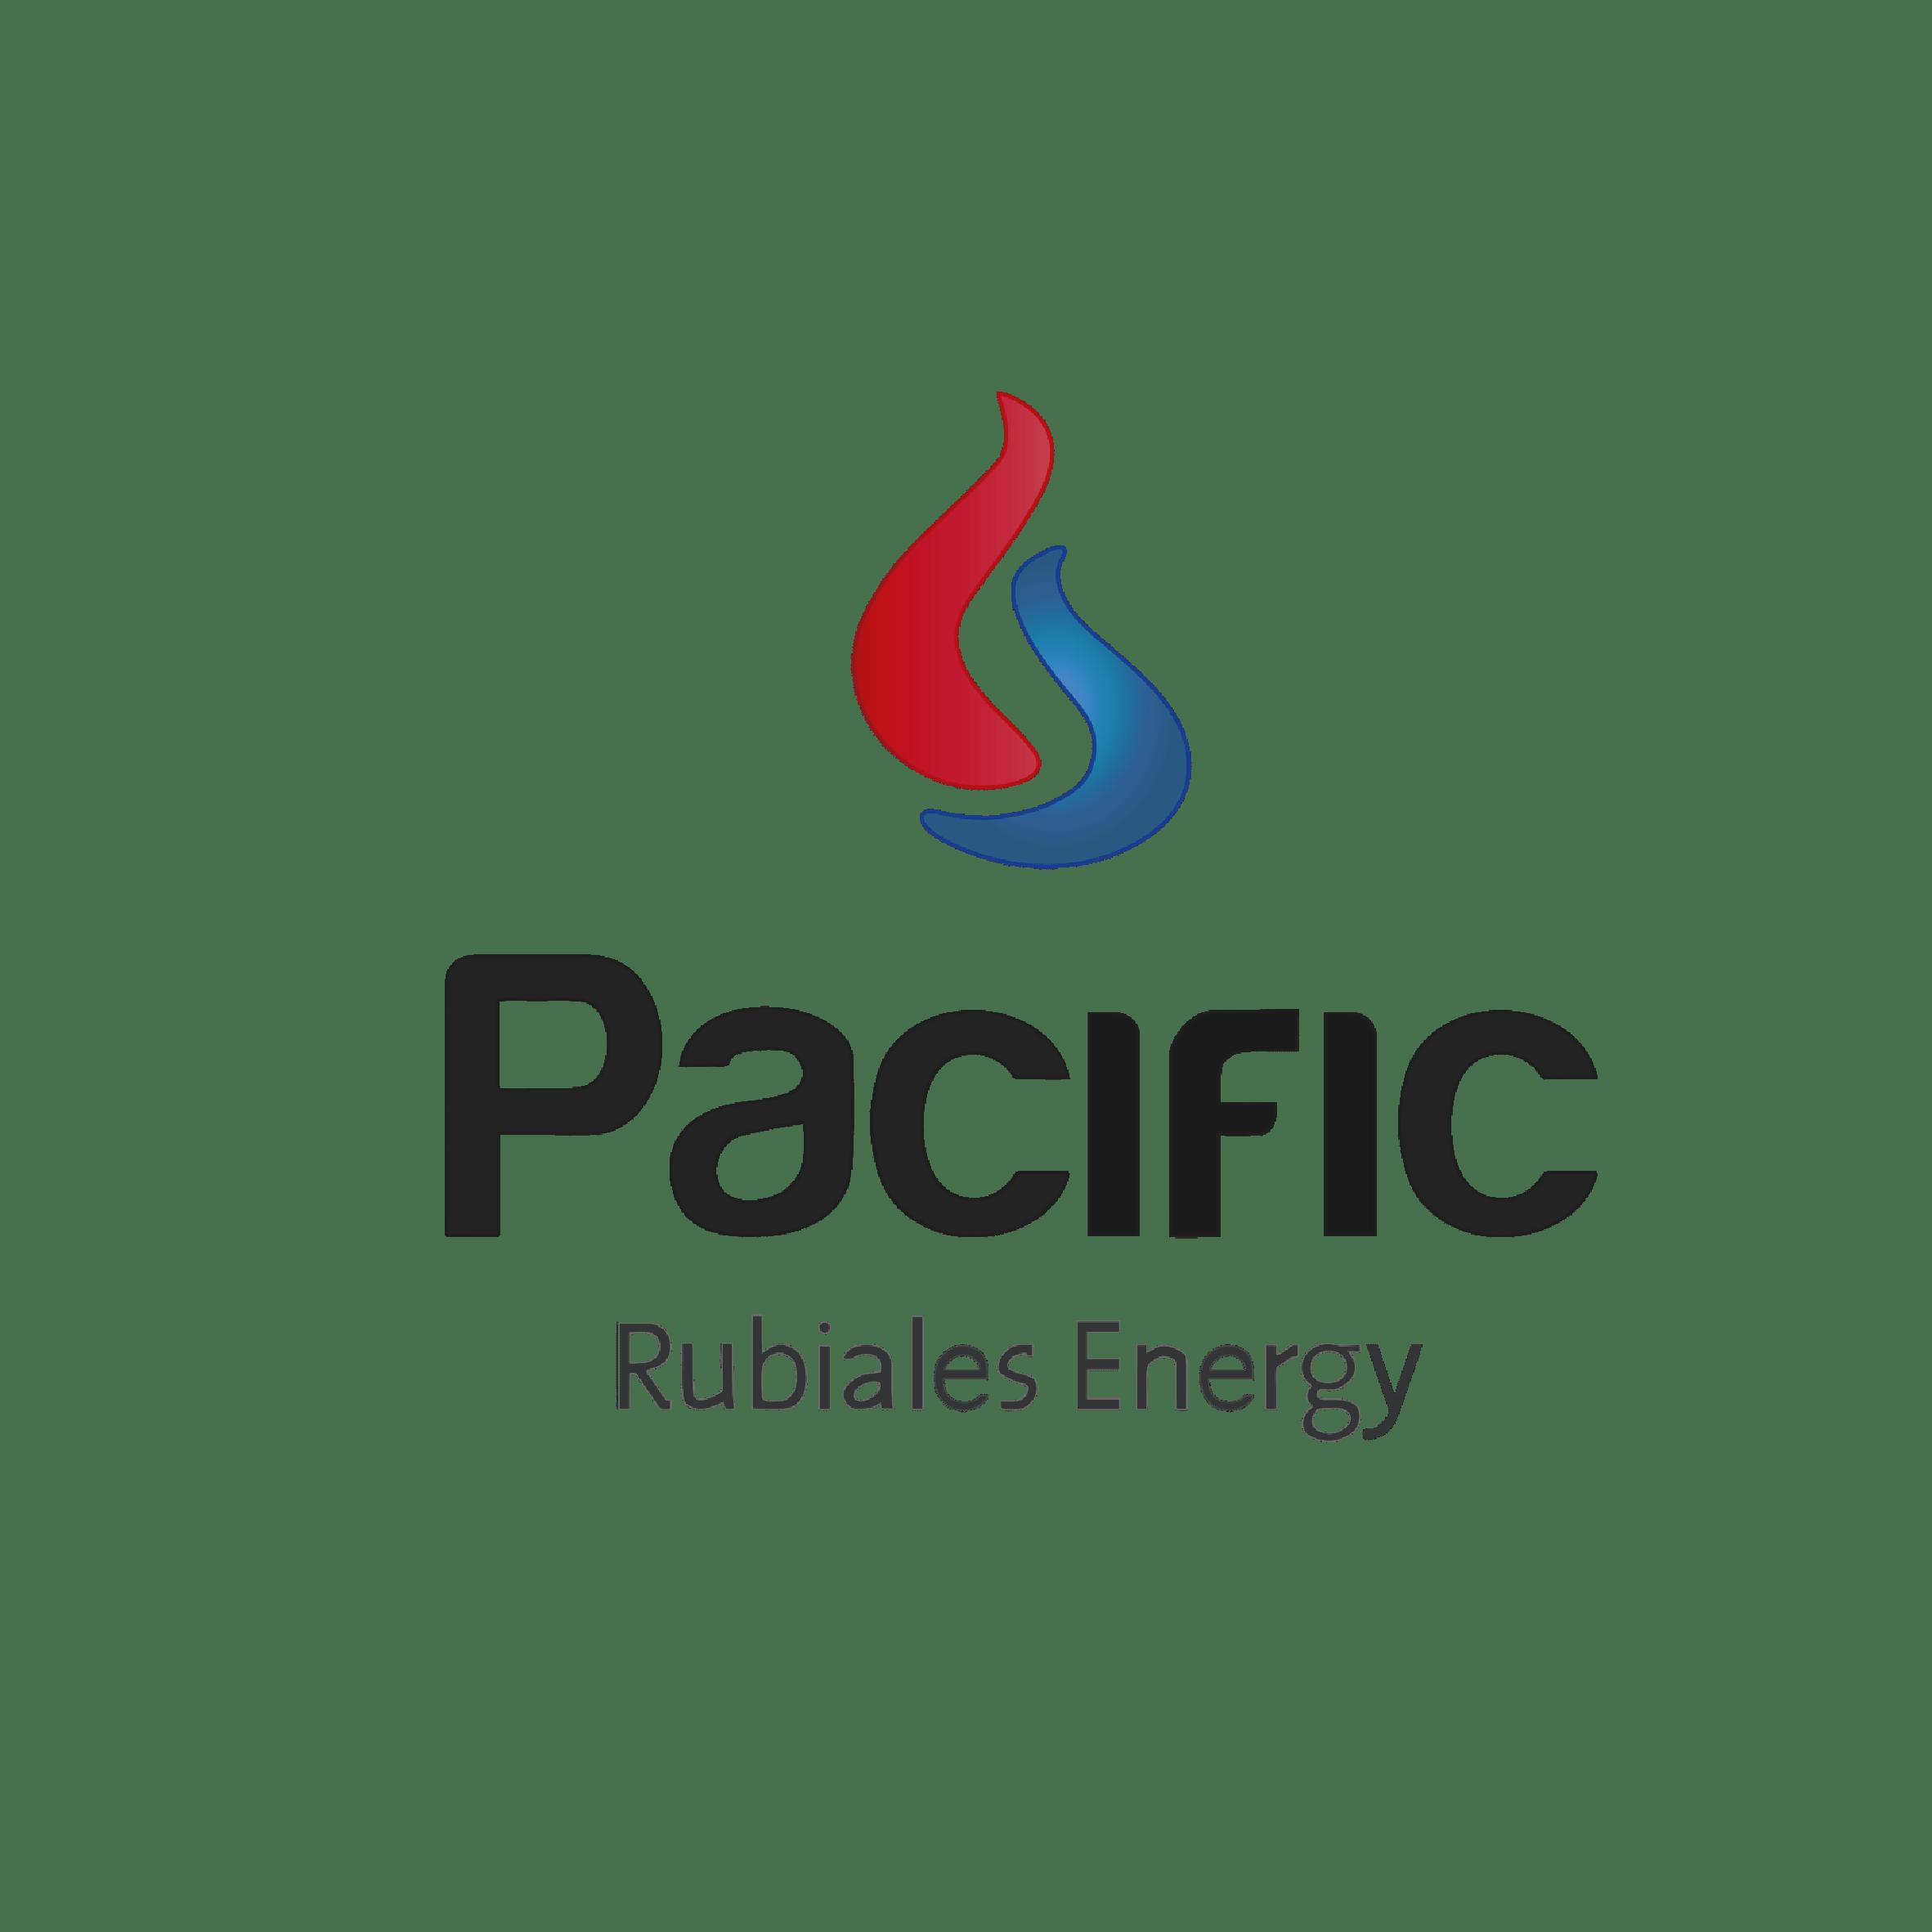 Responsabilidad Ambiental- Pacific Rubiales